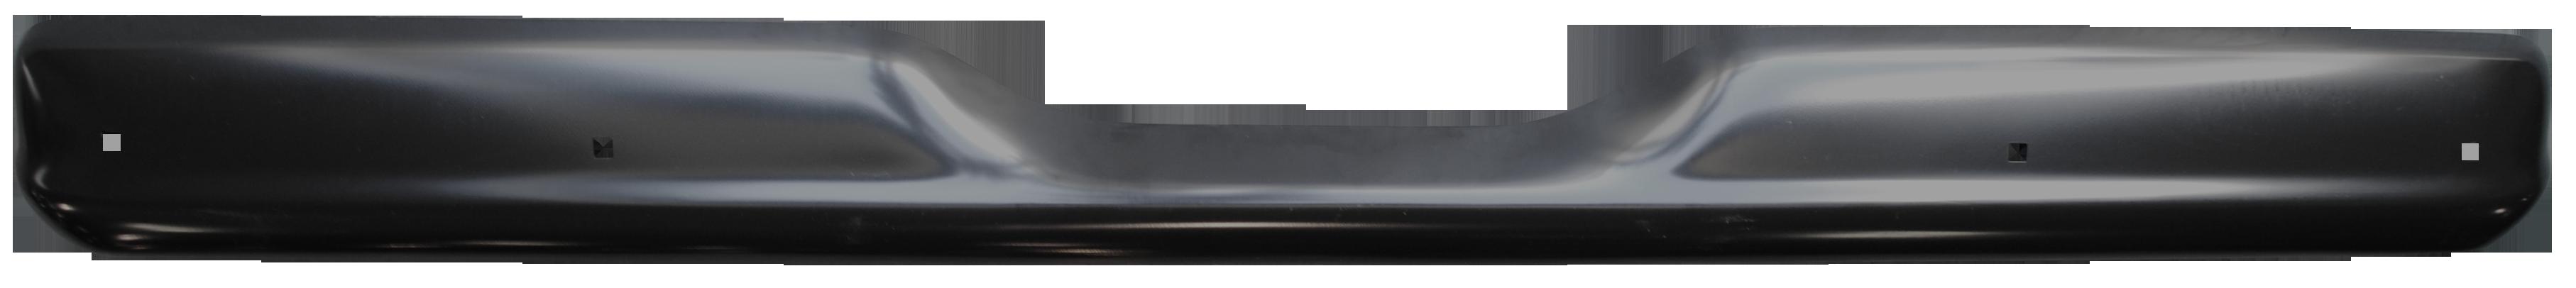 1960-62 C10 rear bumper paintable w/o license hole